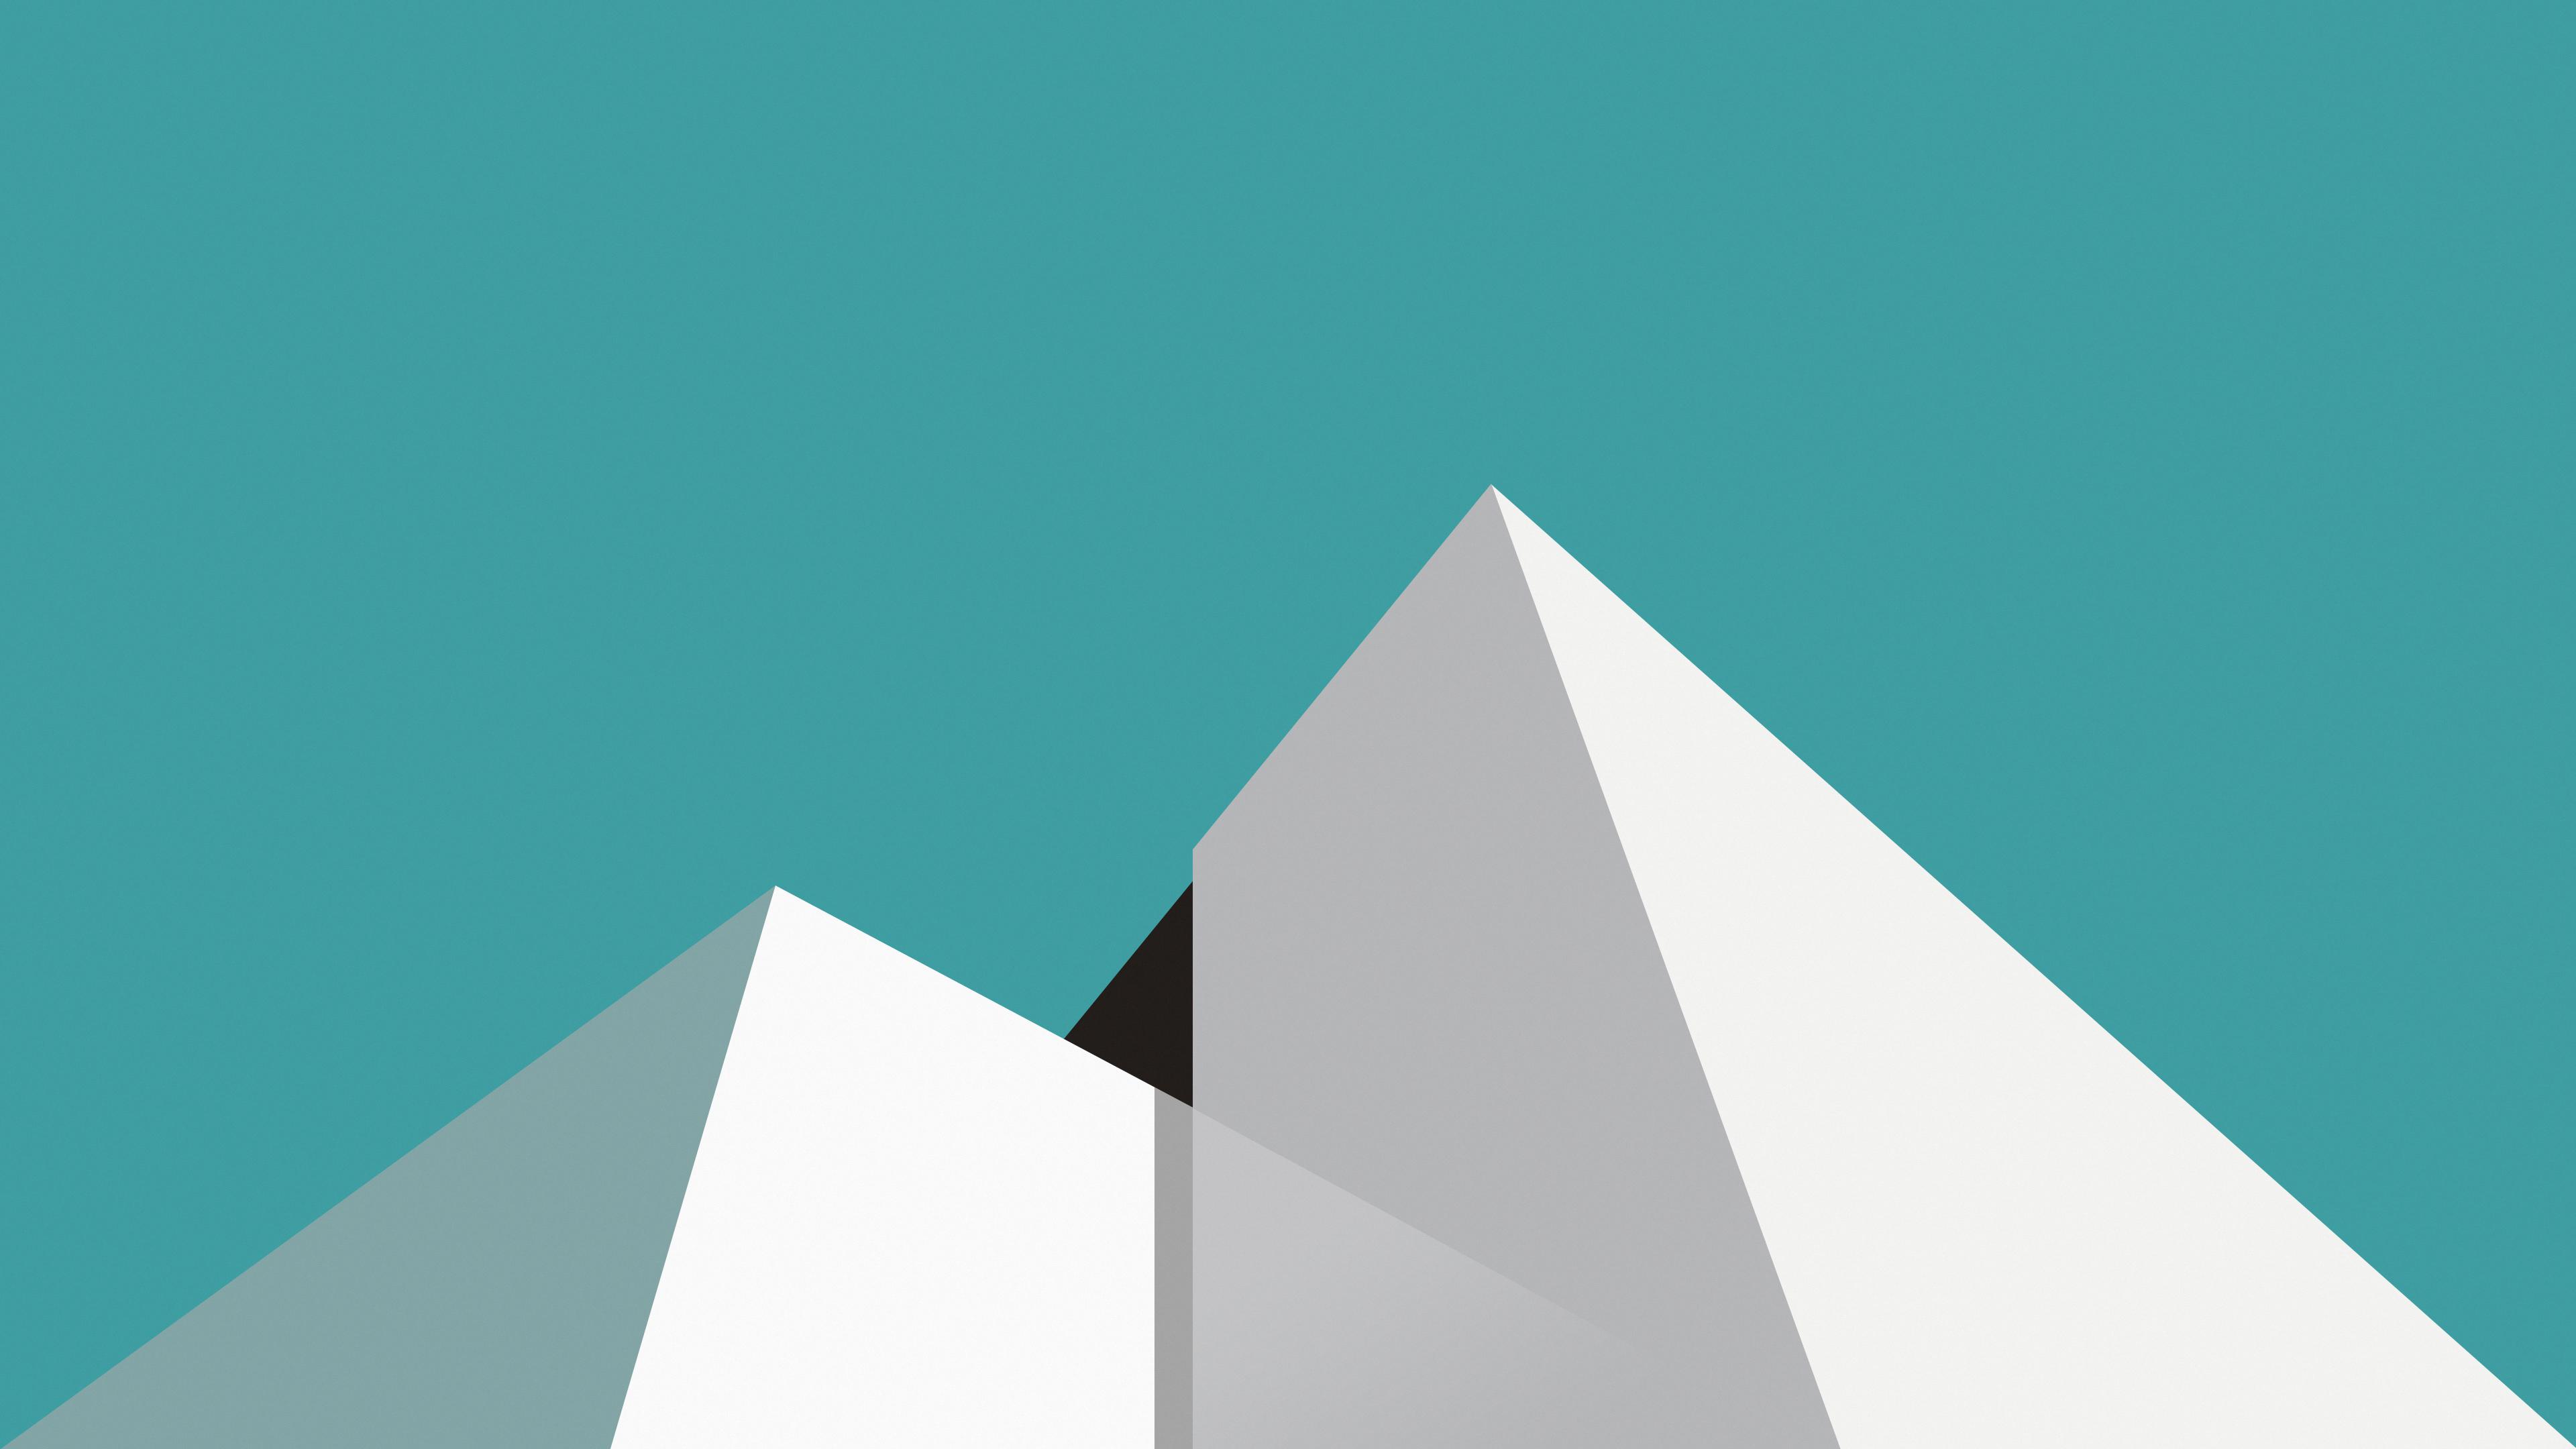 building minimalistic 4k 1541970927 - Building Minimalistic 4k - minimalist wallpapers, minimalism wallpapers, hd-wallpapers, digital art wallpapers, deviantart wallpapers, building wallpapers, artwork wallpapers, artist wallpapers, 4k-wallpapers